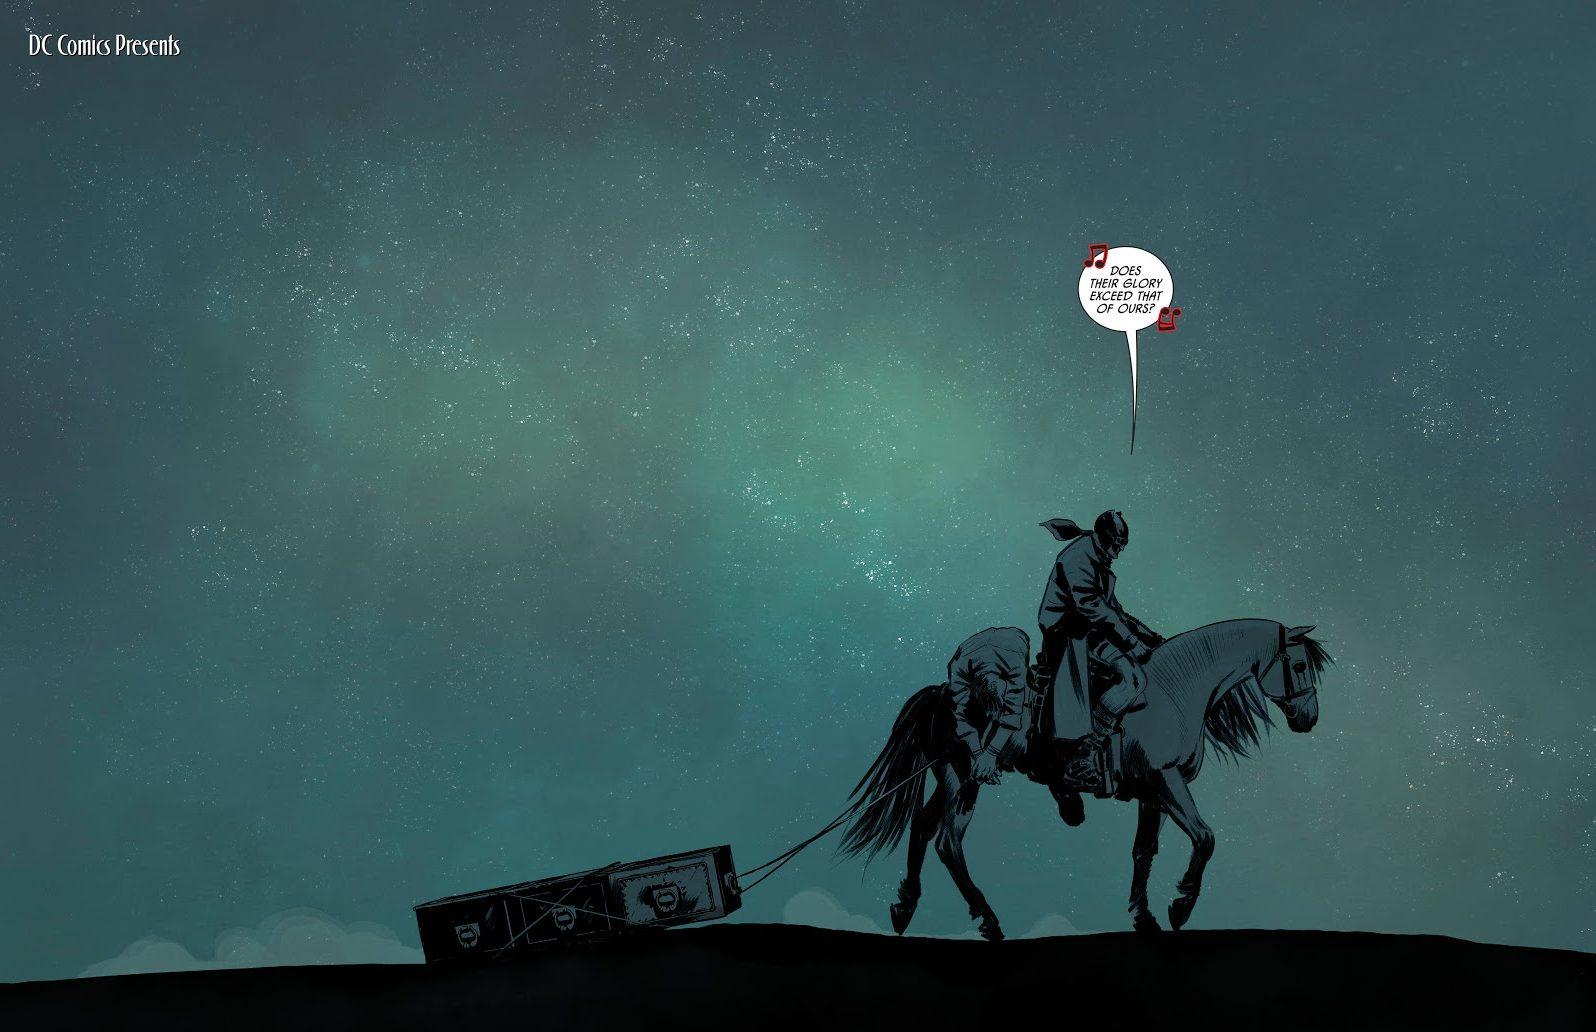 Thomas Wayne (Batman Vol. 3 #73)